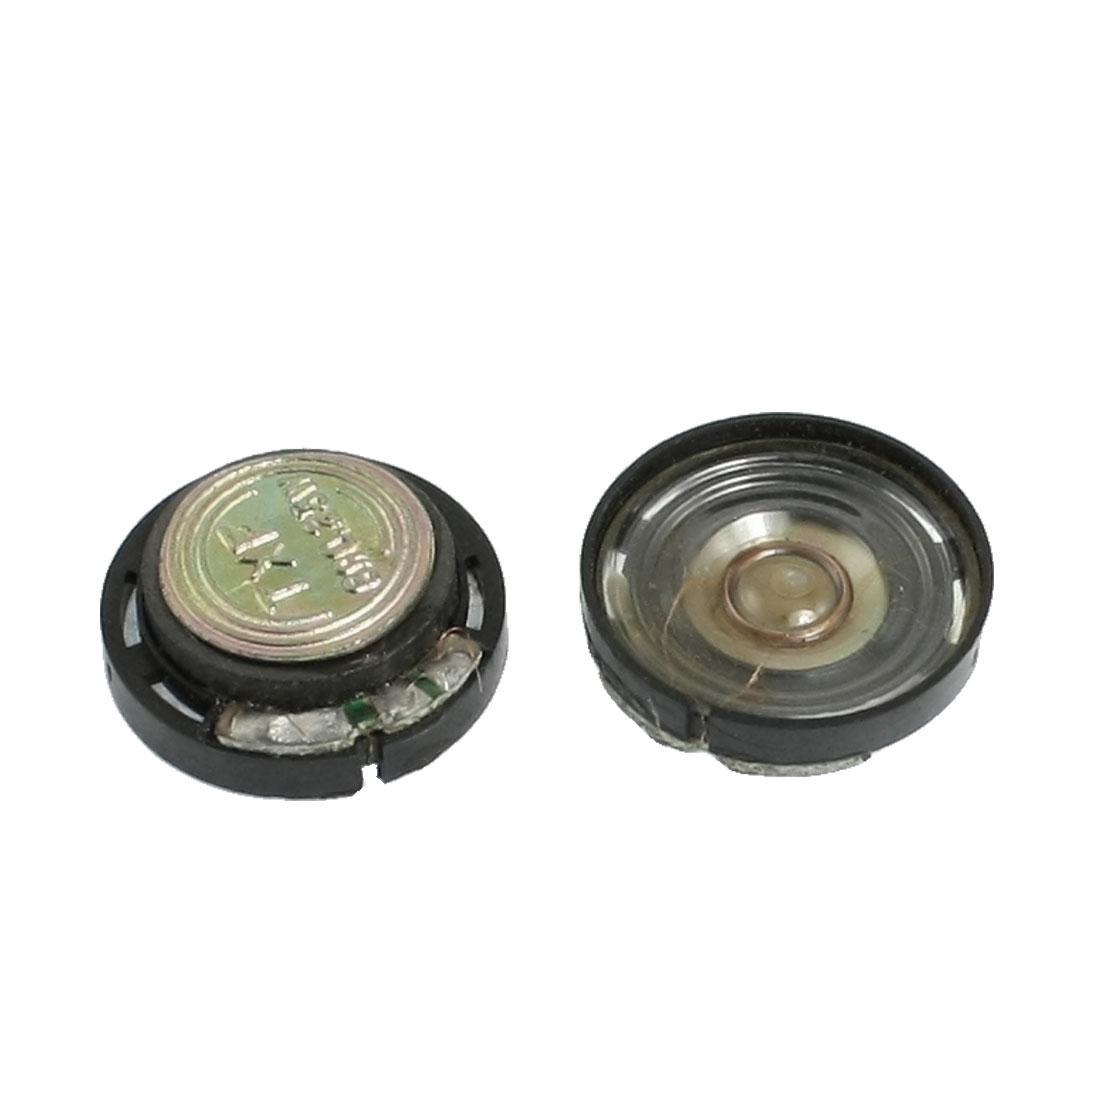 20mm External Magnetic Type Round Slim Plastic Shell Speaker 8 Ohm 0.25W 2 Pcs